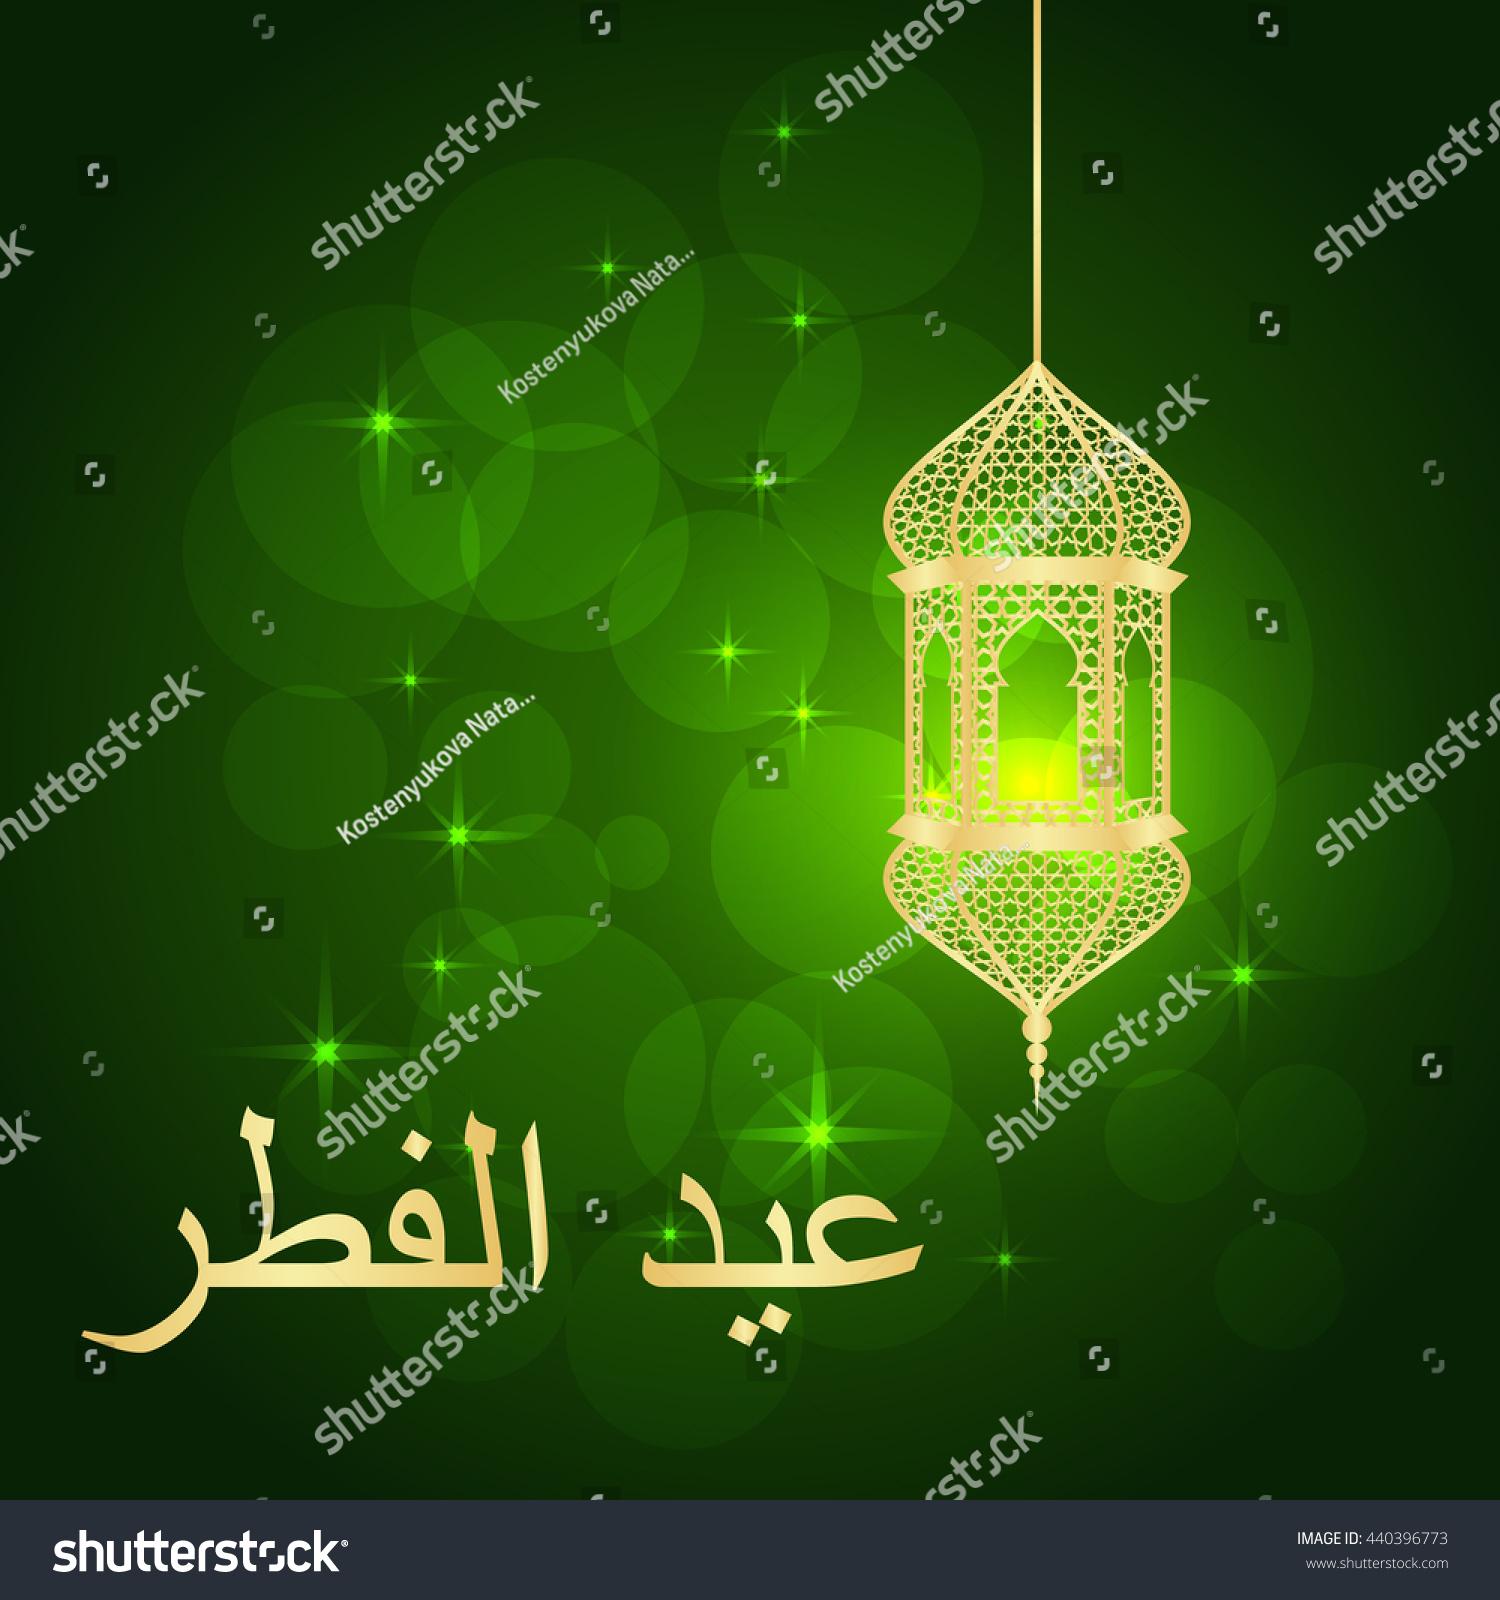 Simple Id Festival Eid Al-Fitr Greeting - stock-vector-eid-al-fitr-greeting-card-on-green-background-vector-illustration-eid-al-fitr-means-festival-of-440396773  Image_835847 .jpg